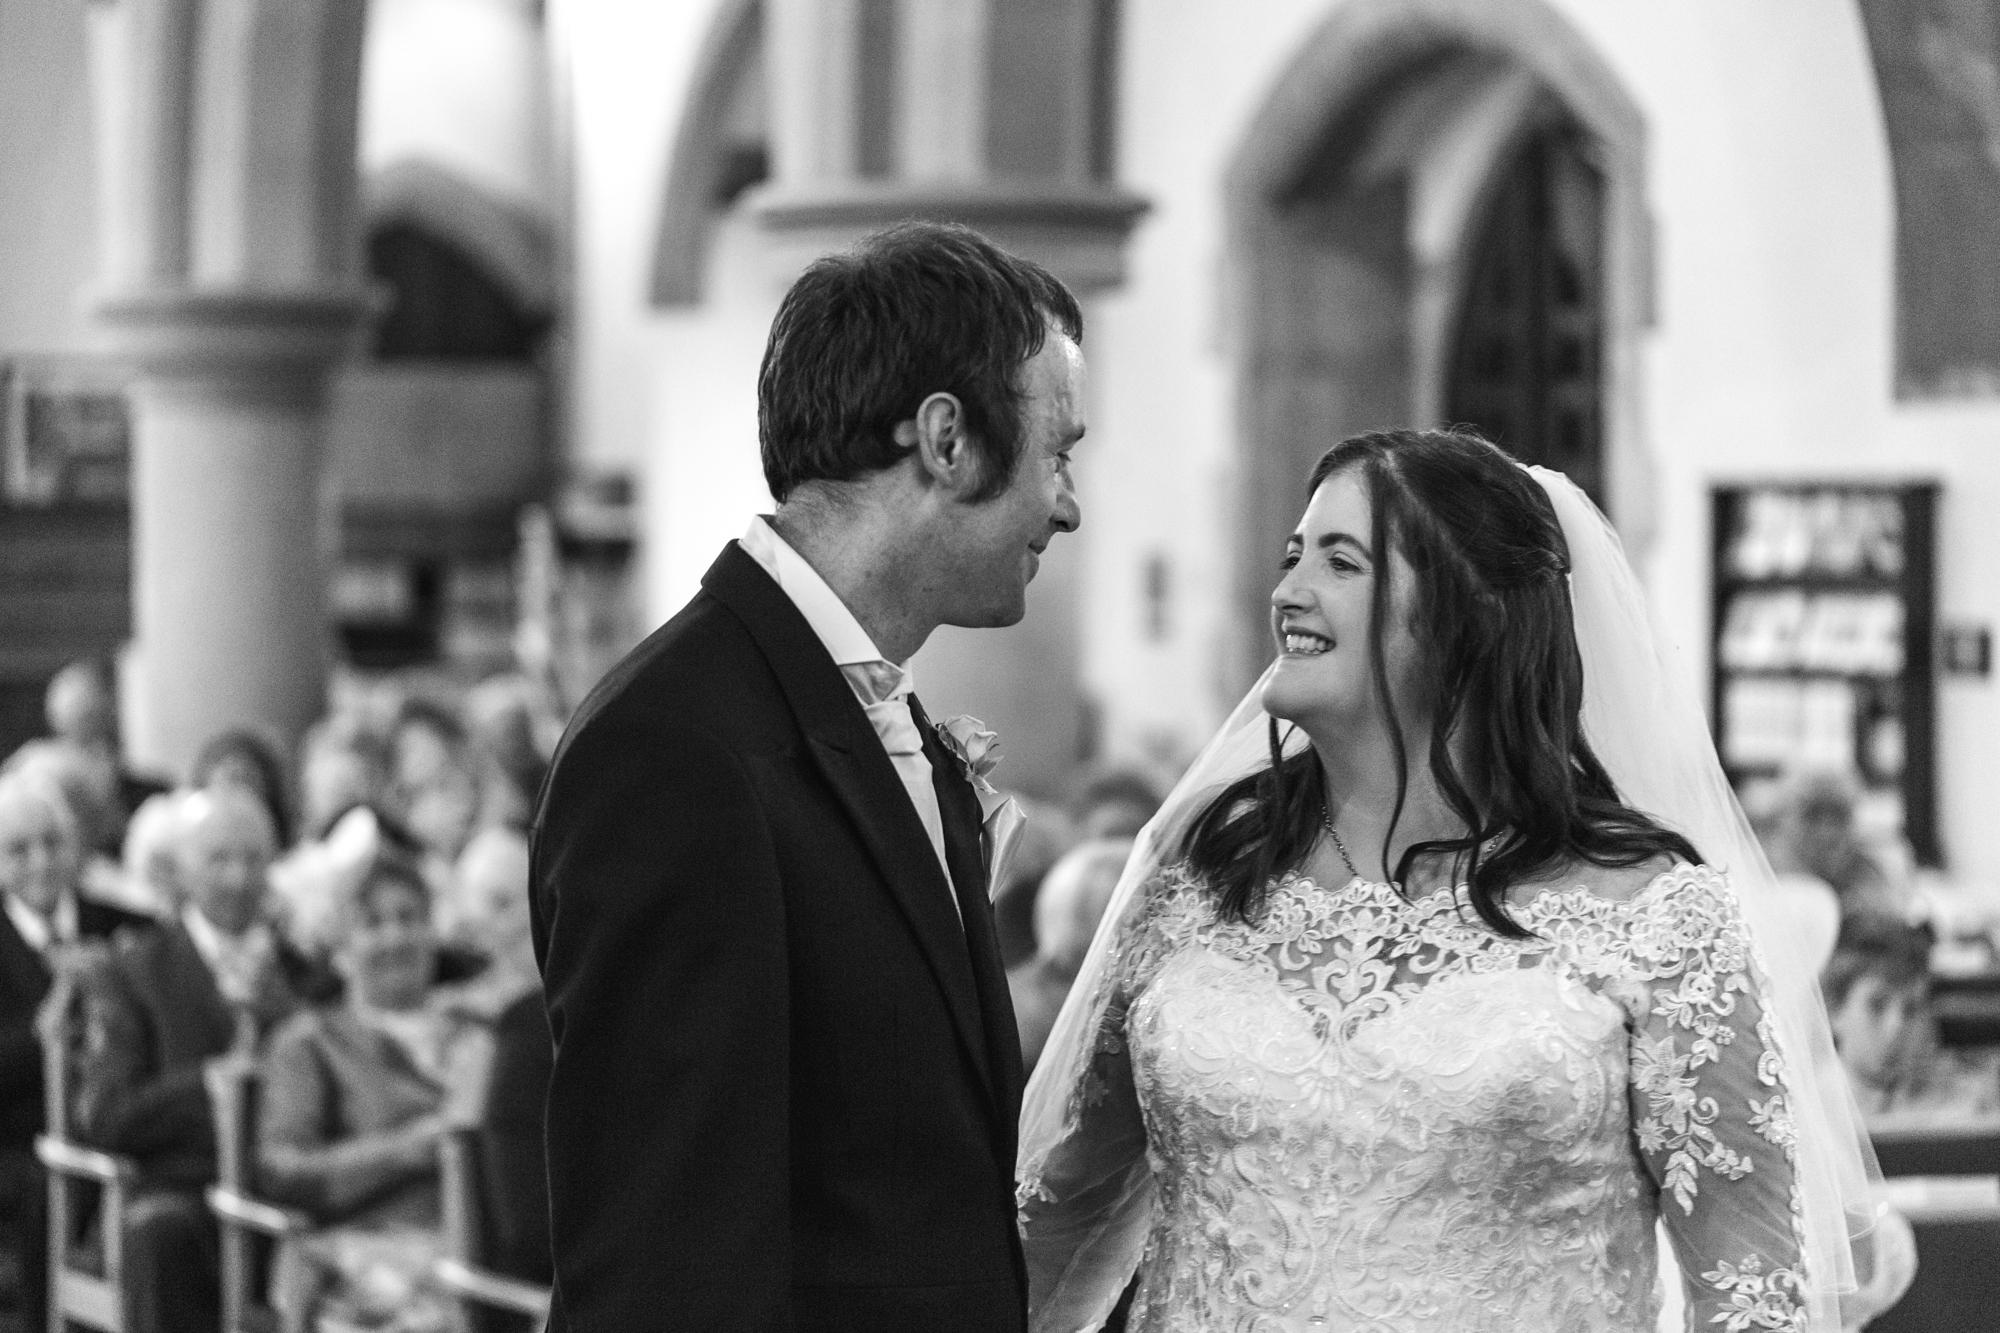 wedding ceremony at St Martins Church, Caerphilly